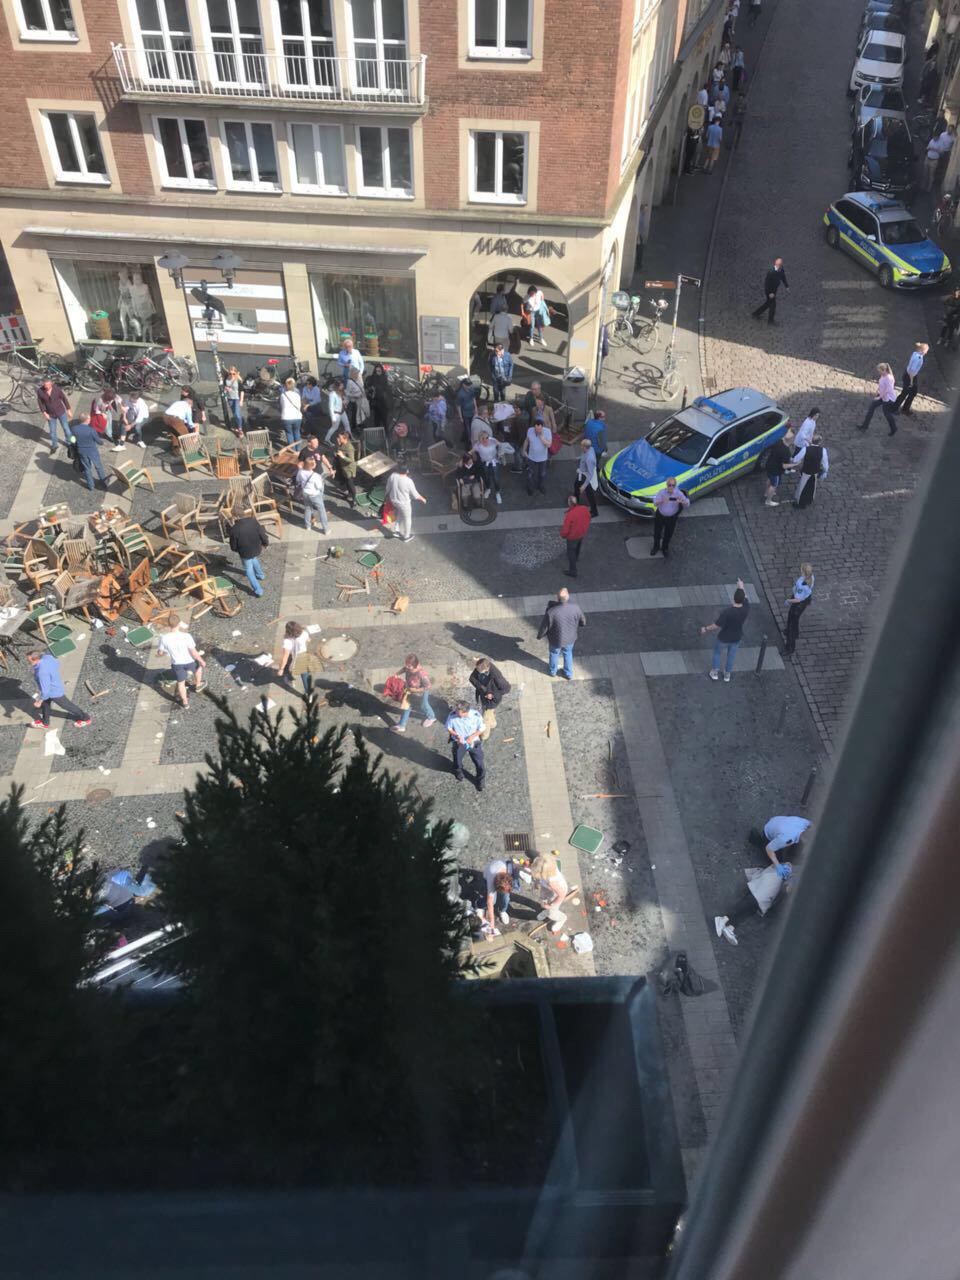 2 Dead After Van Drives Into Pedestrians In